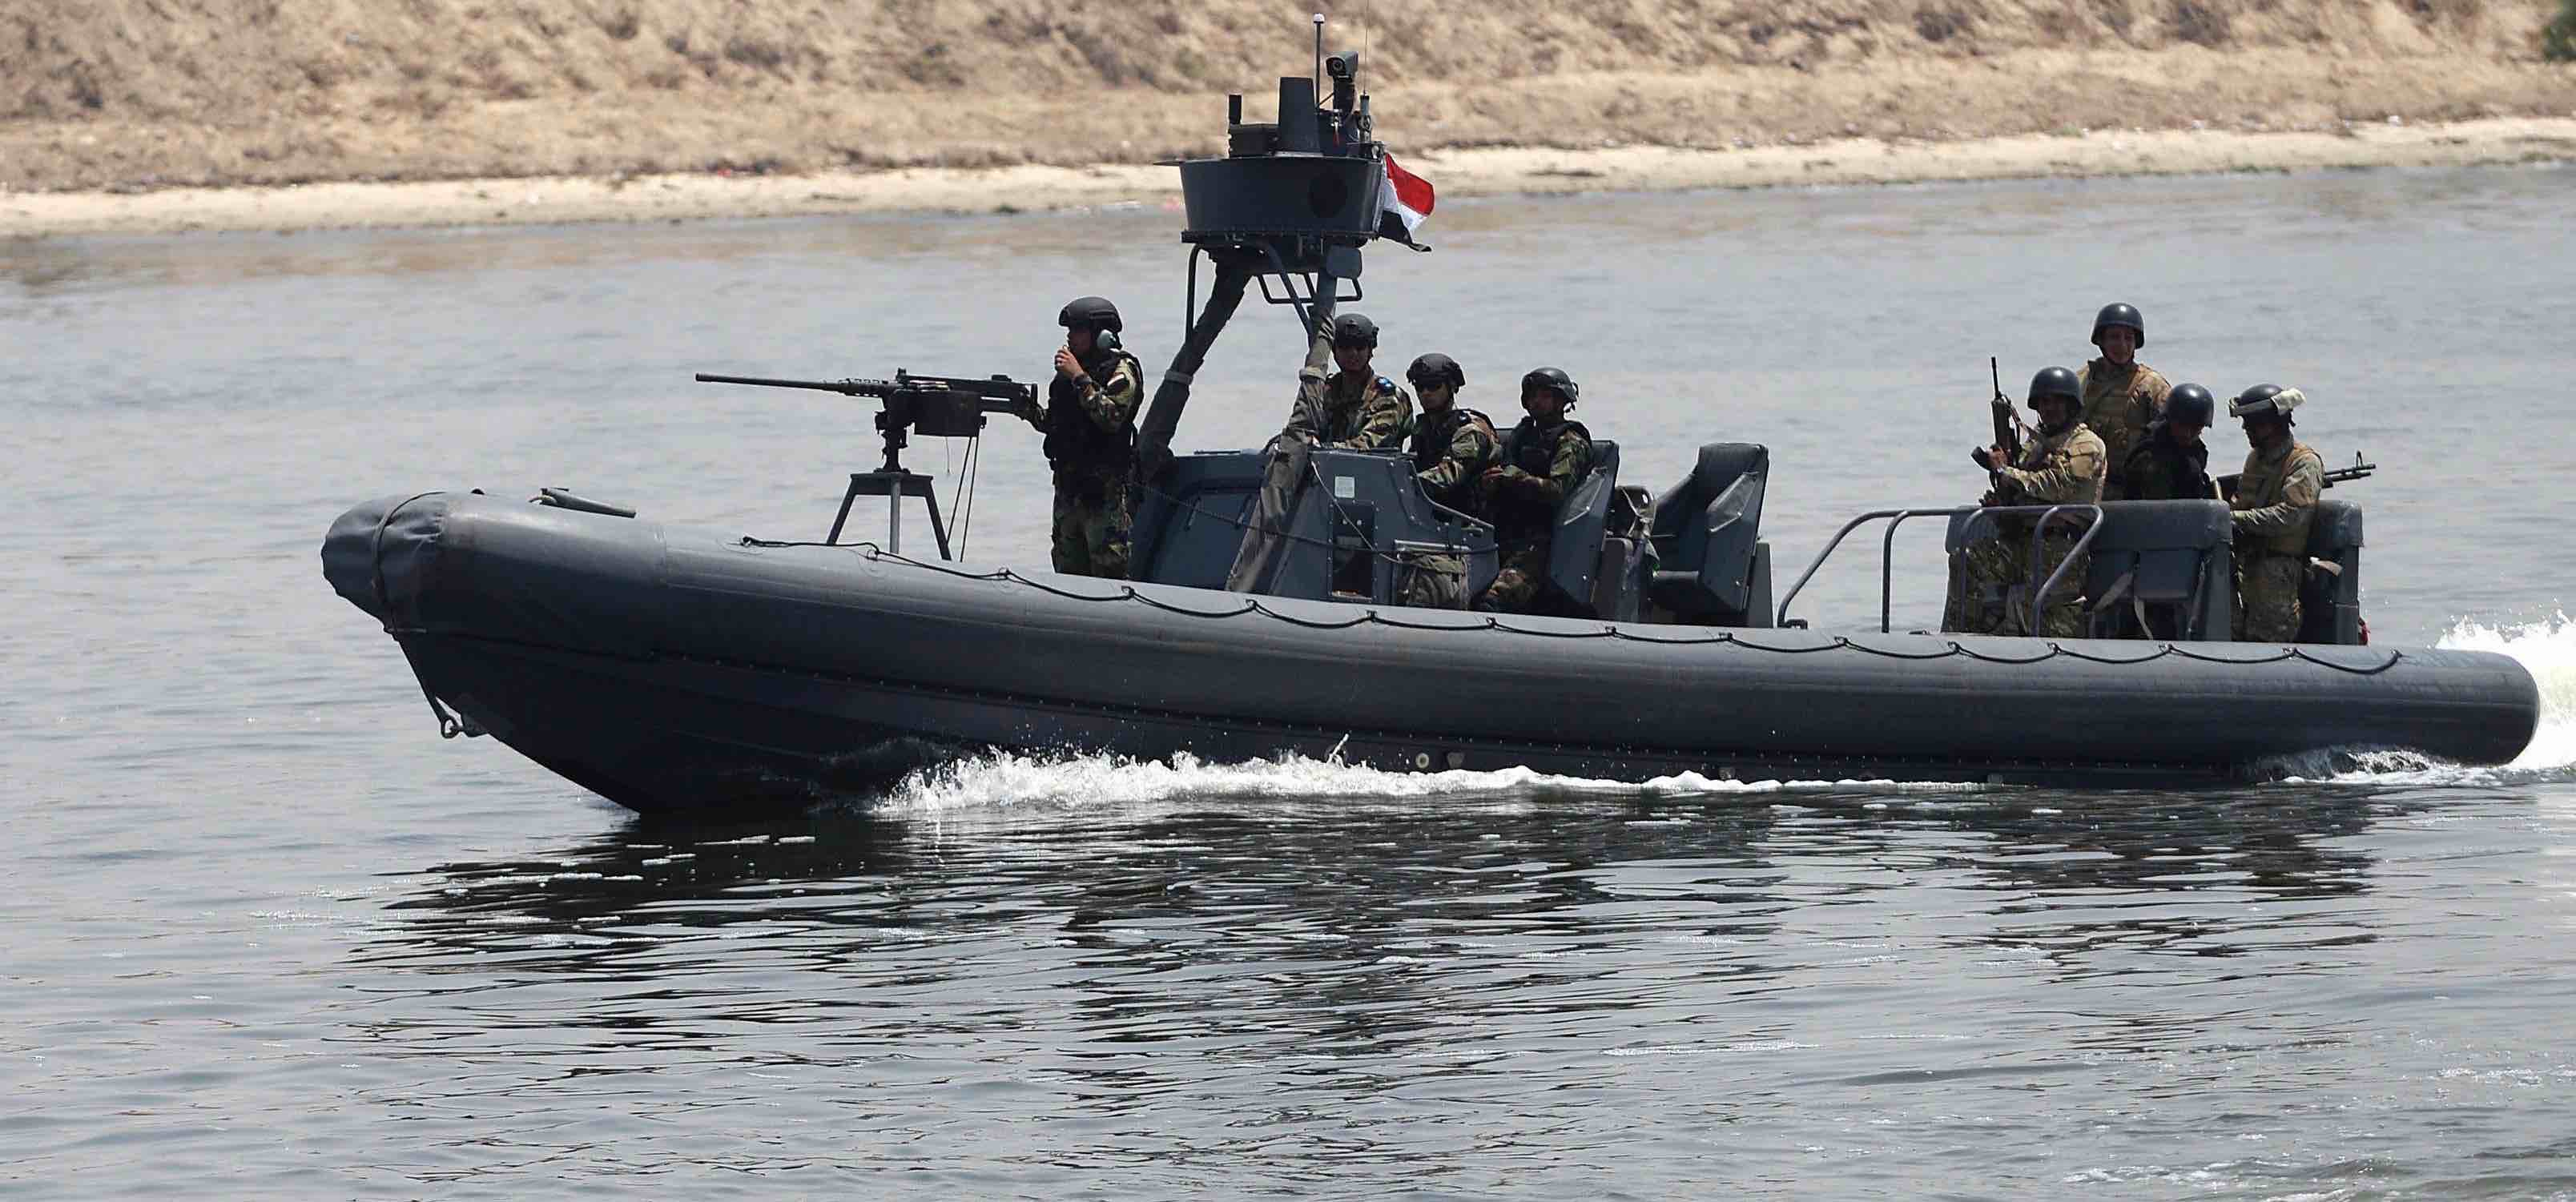 An Egyptian patrol in the Suez Canal (Photo: Anadolu Agency via Getty)